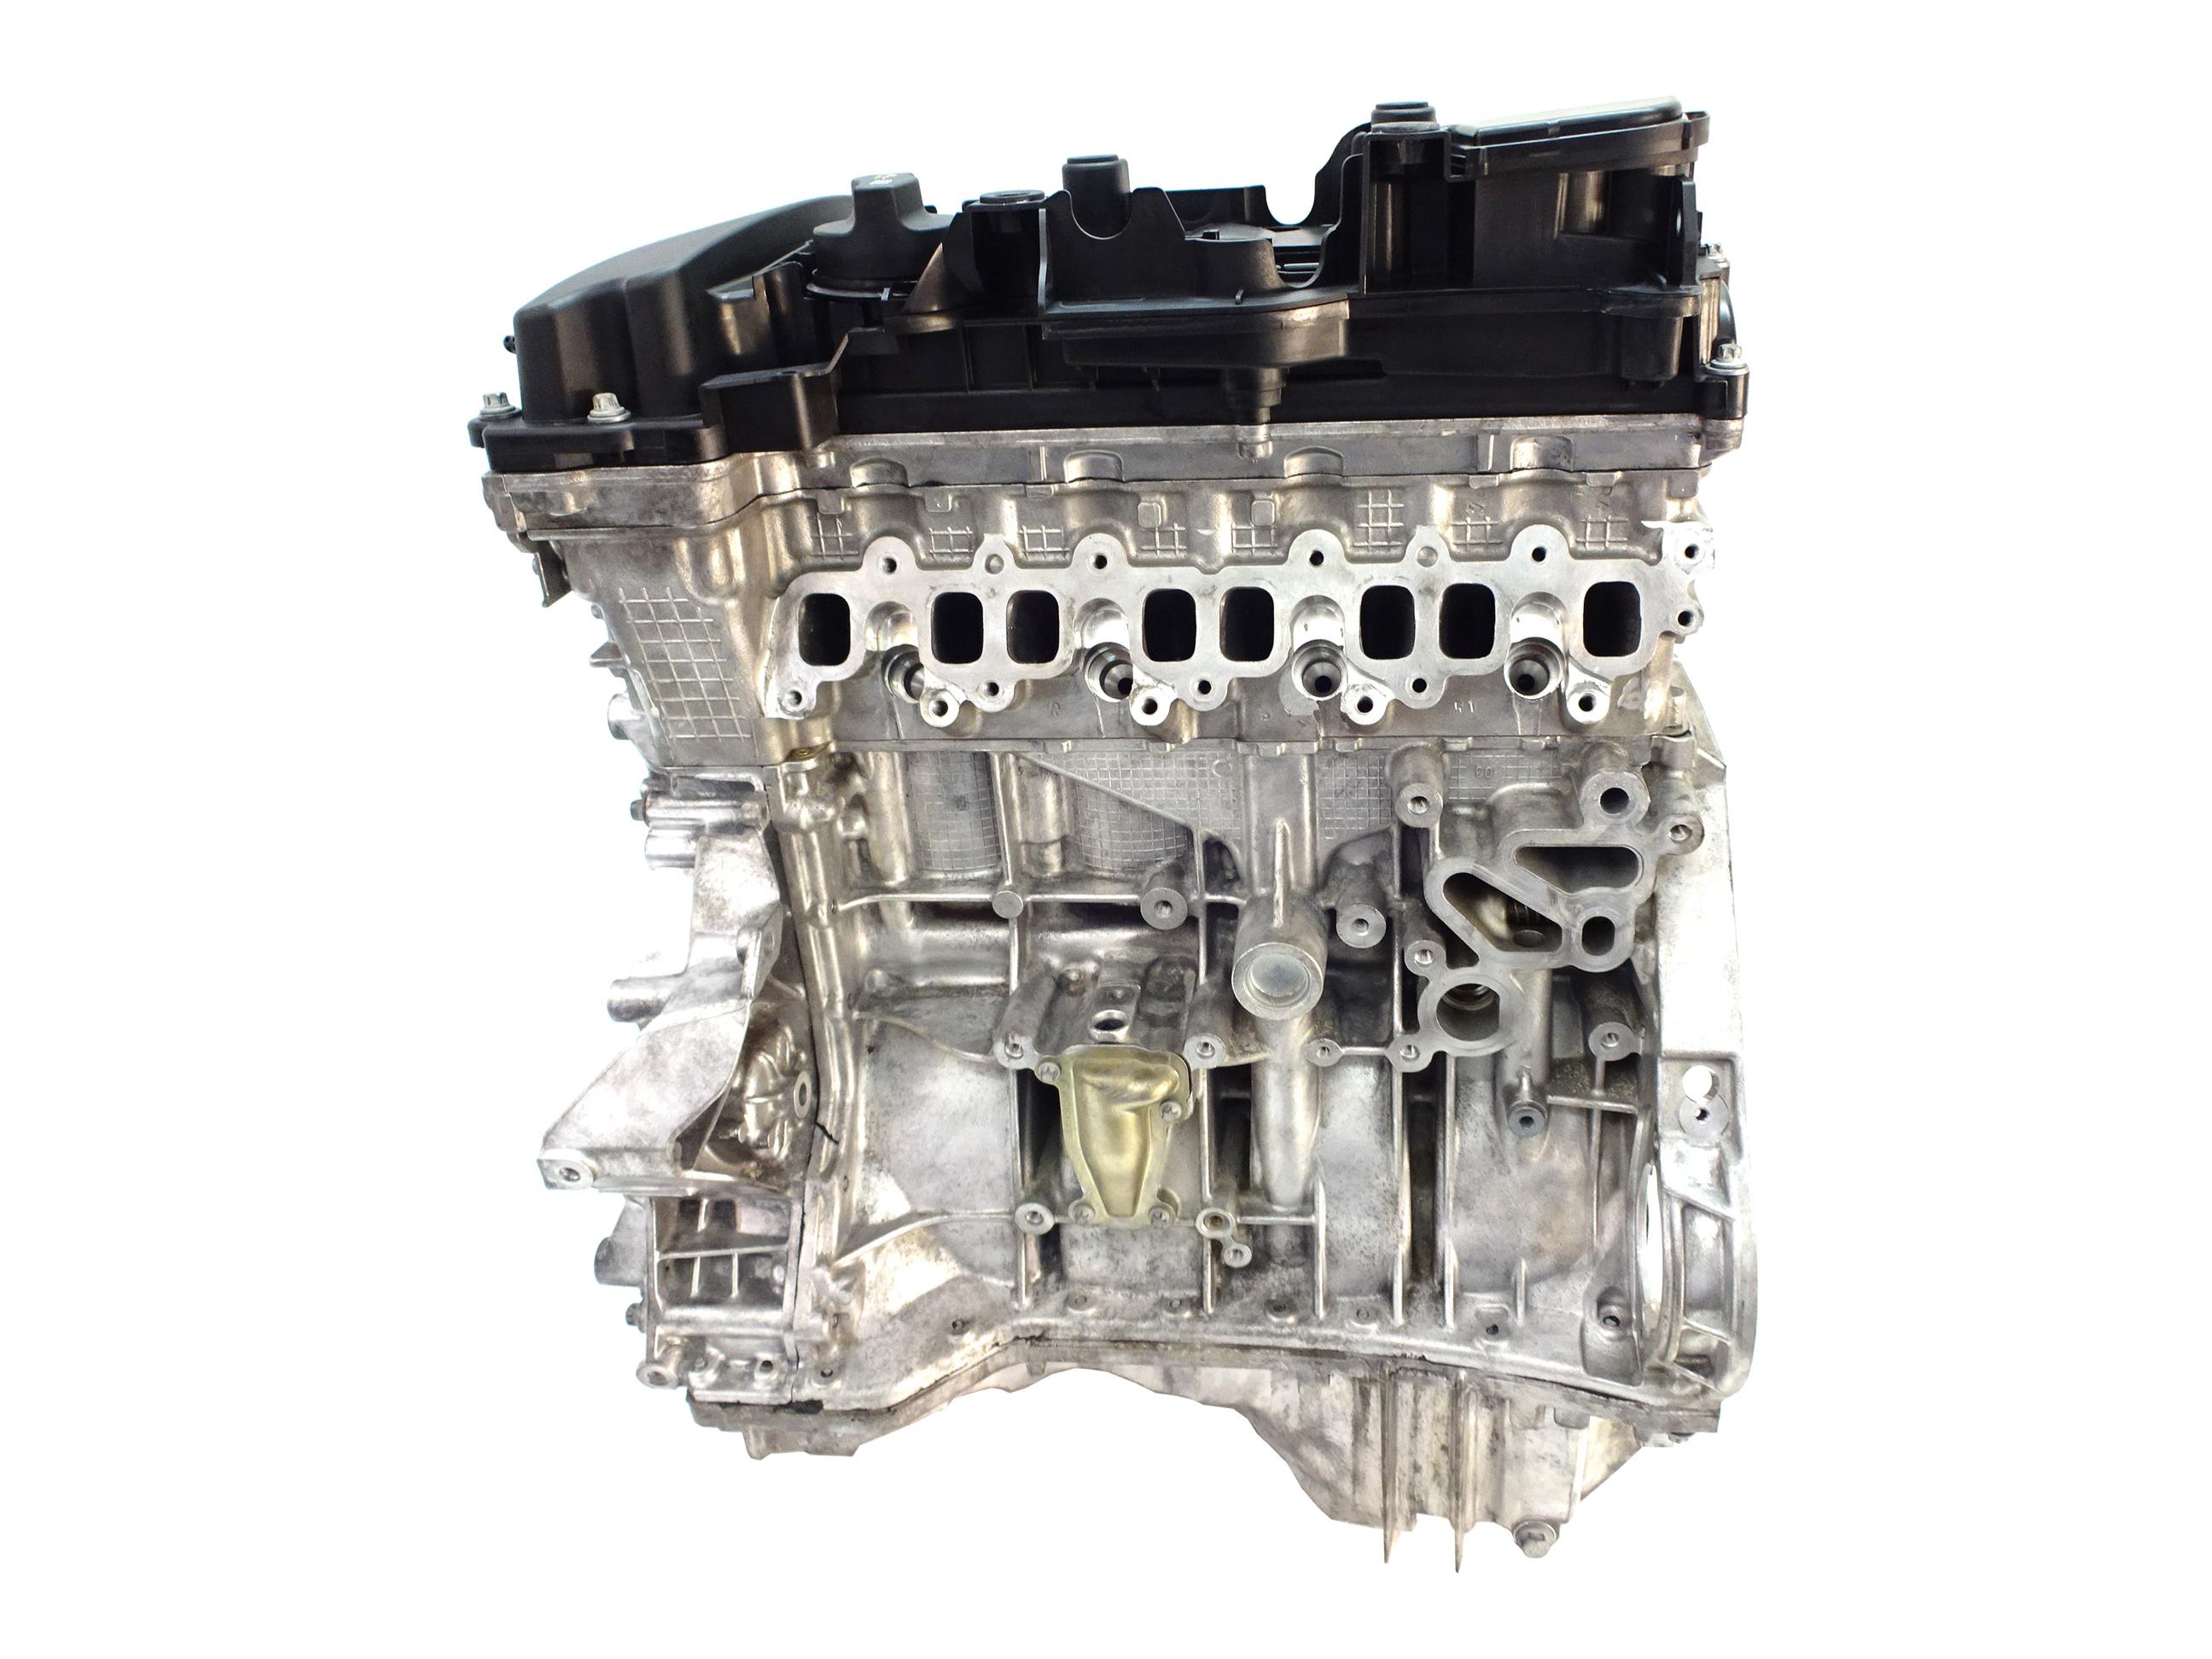 Motor Überholung Instandsetzung Reparatur Mercedes 180 200 CGI 1,8 M271 M271.8